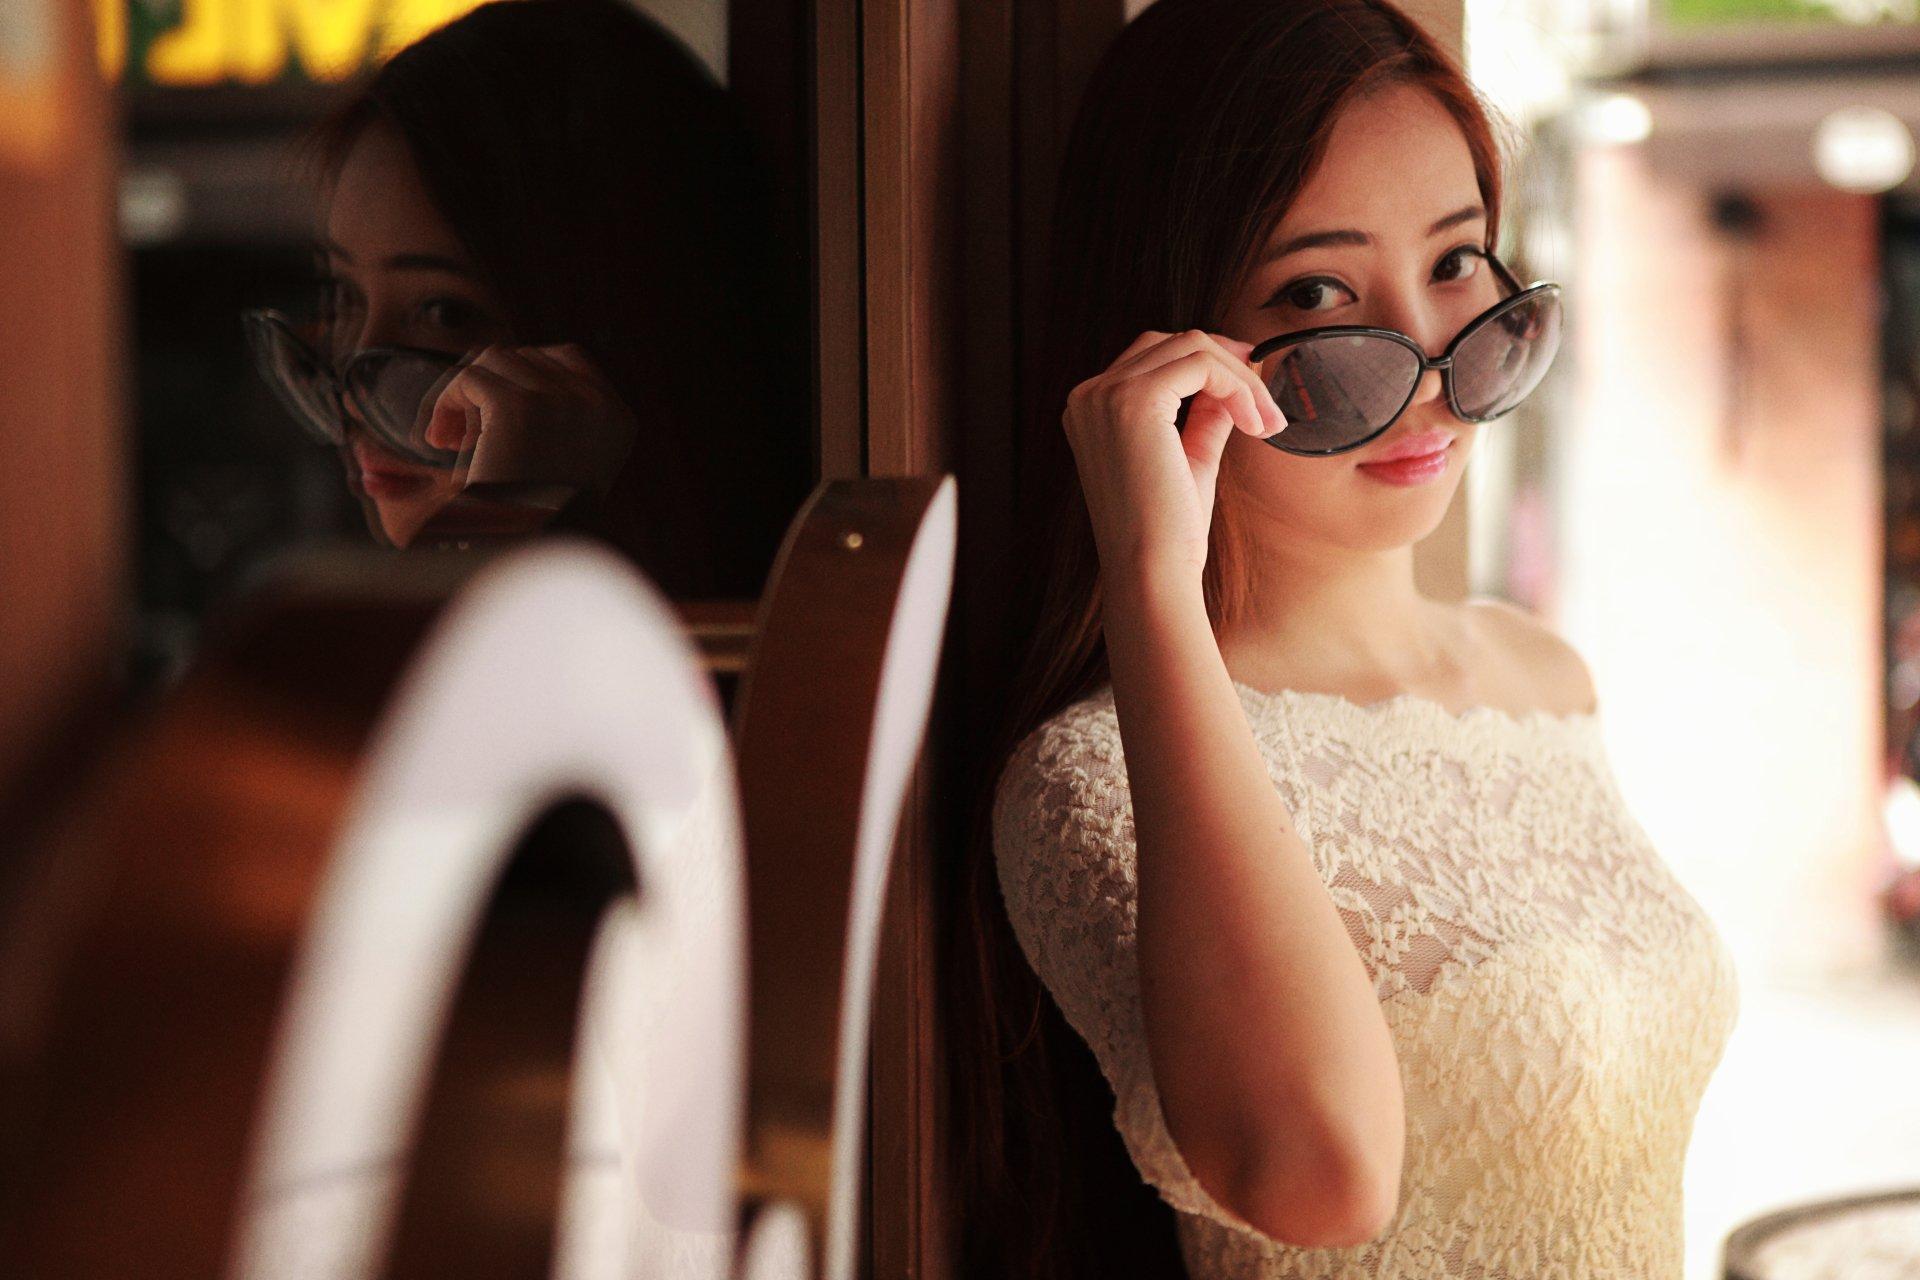 Women - Asian  Girl Dress Glasses Reflection Face Wallpaper